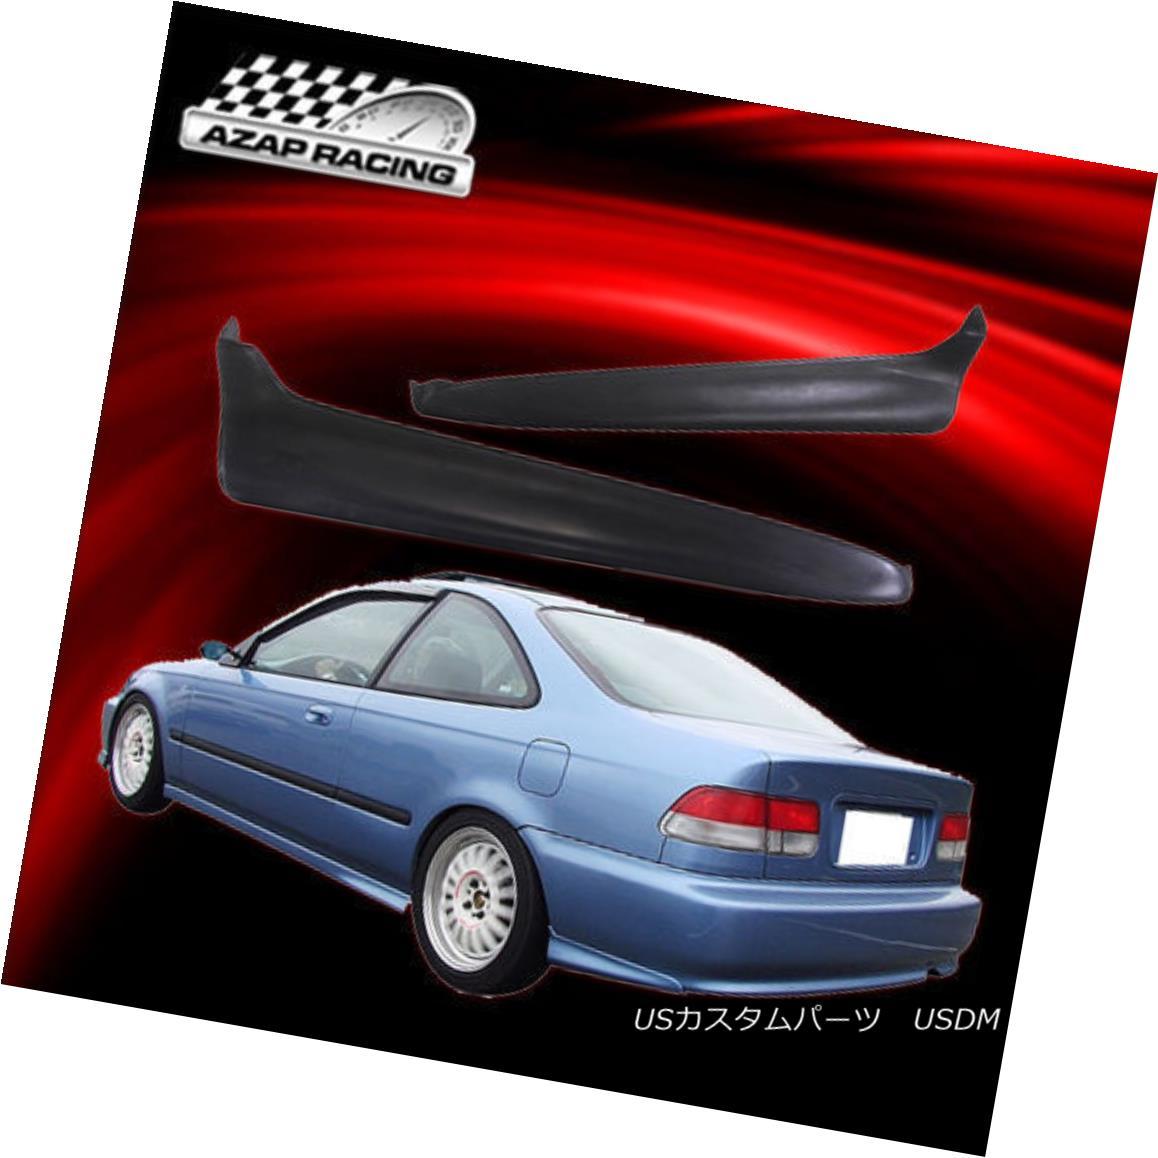 VAUXHALL TIGRA 1.4 16V,1.6 16V Coupe back box 1994-1997 Exhaust Rear Silencer